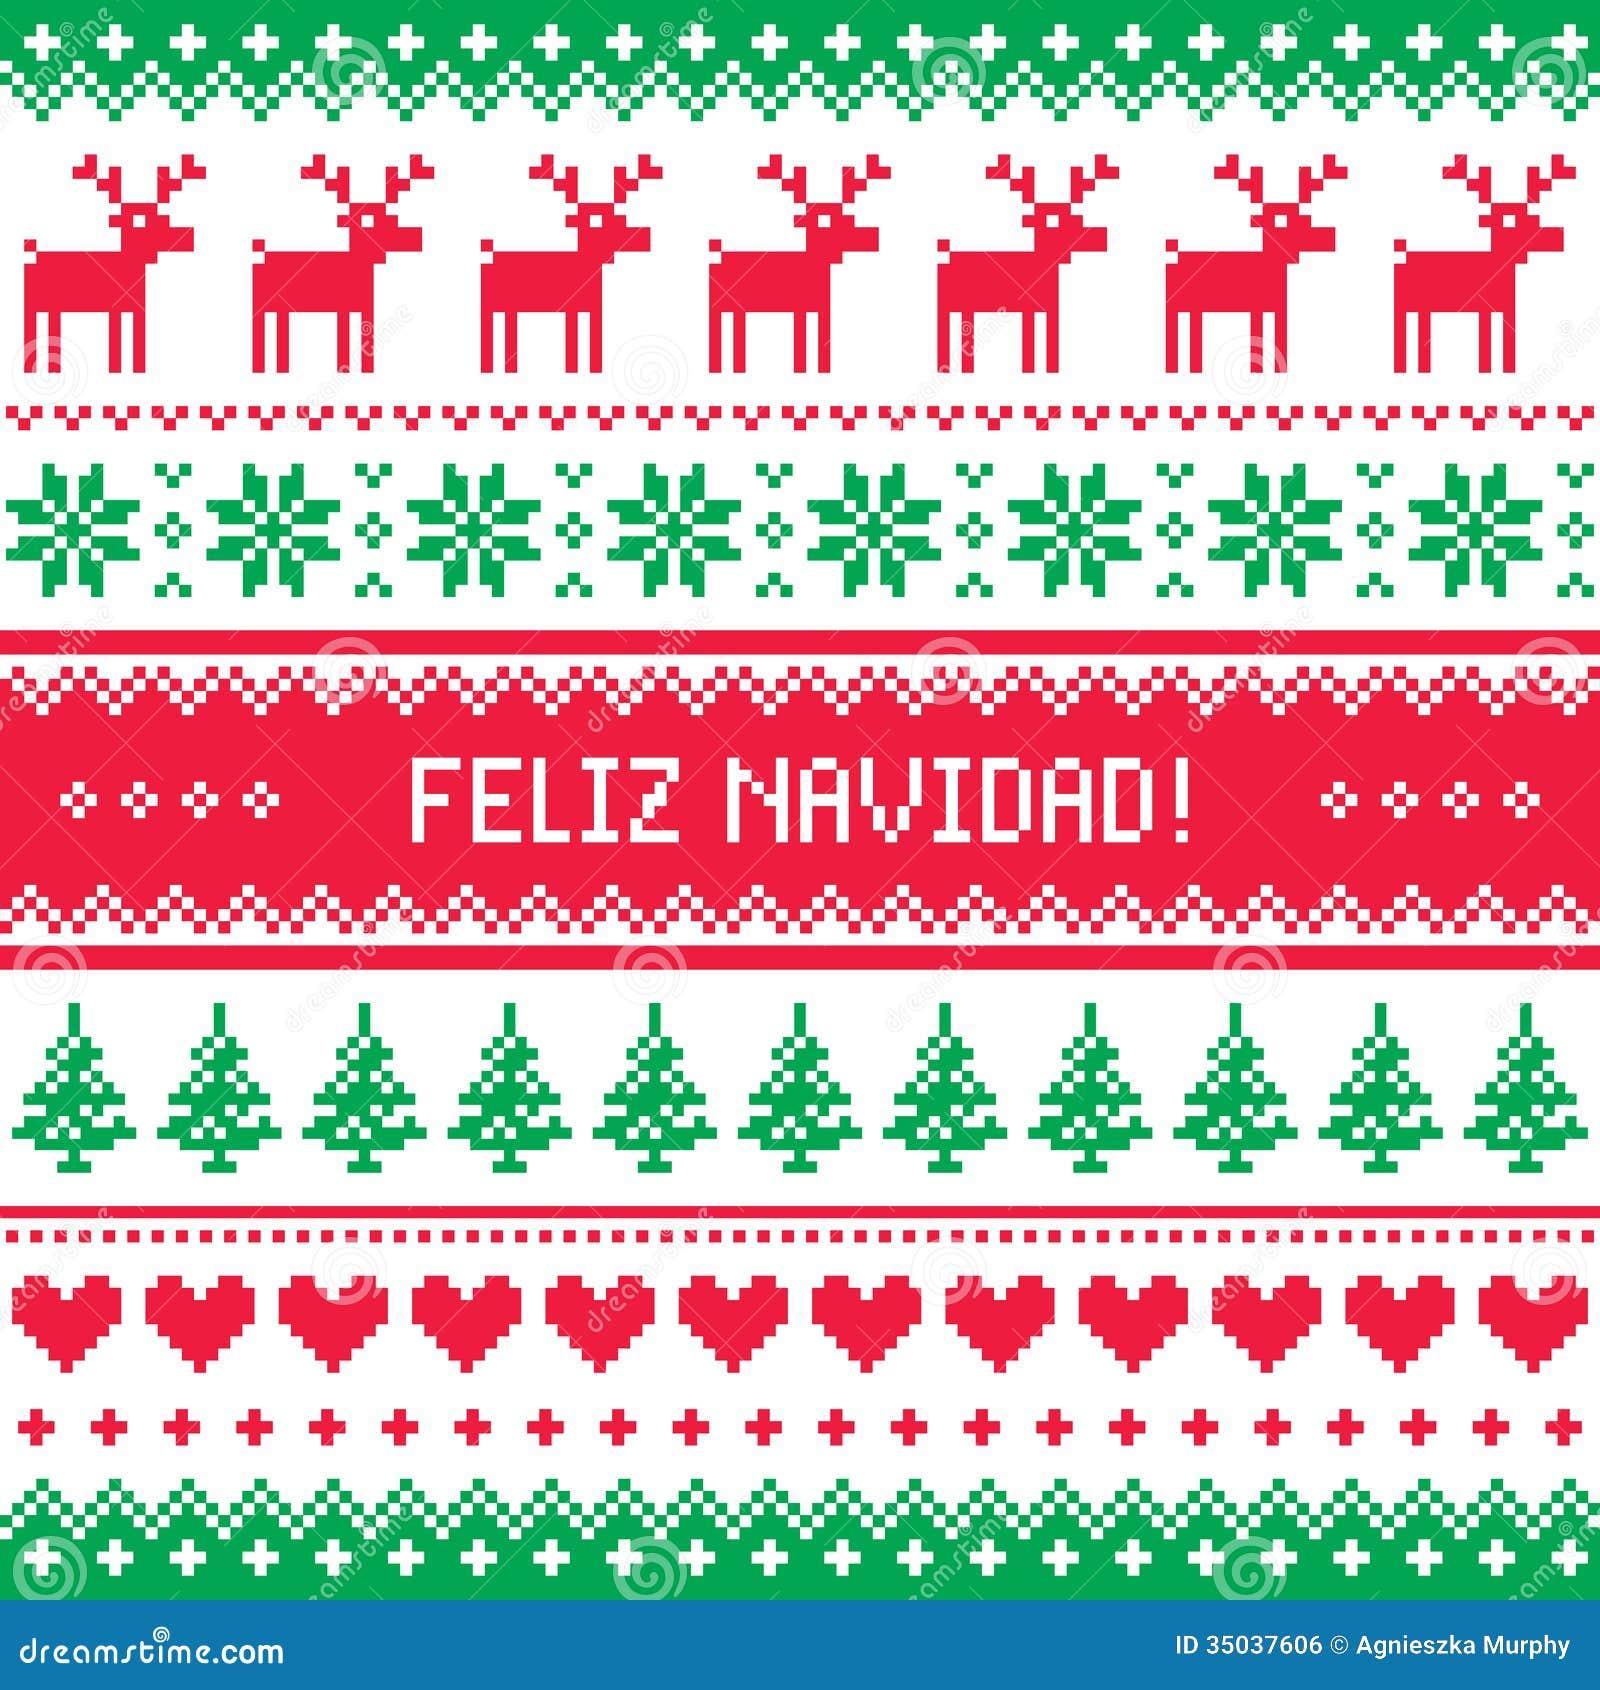 Feliz Navidad Card - Scandynavian Christmas Pattern Royalty Free ...